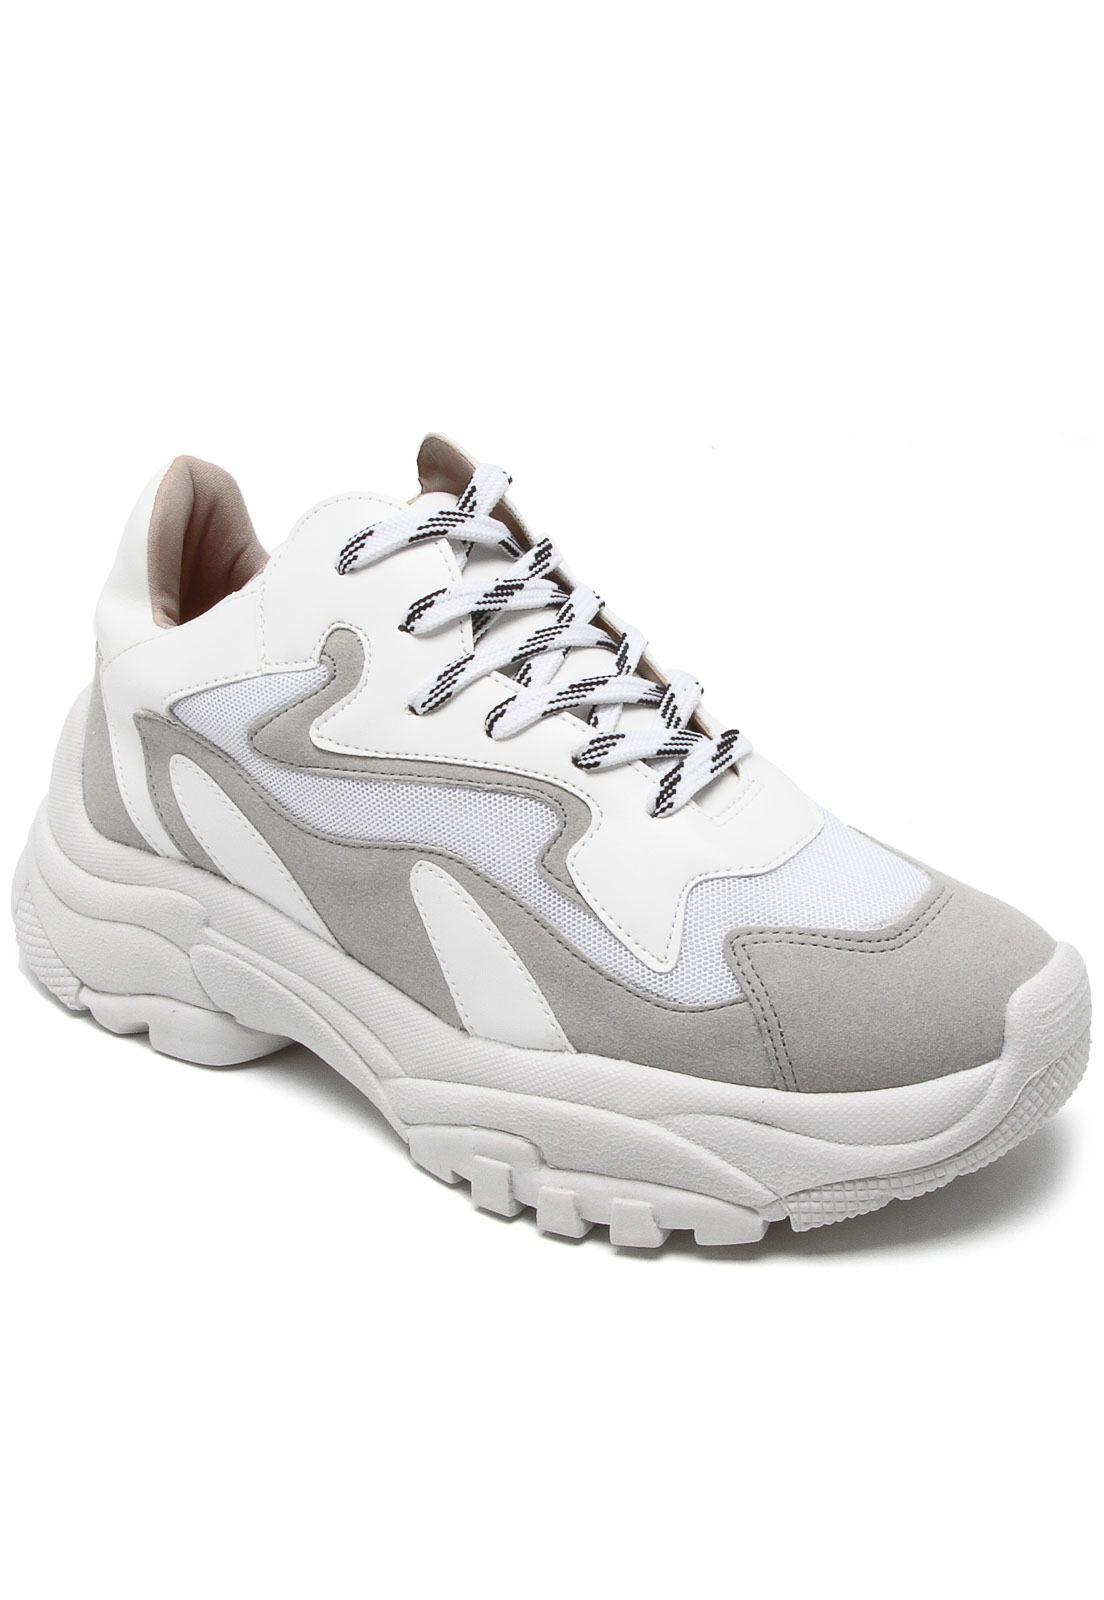 Tênis Chunky Sneaker Branco com Gelo Zatz